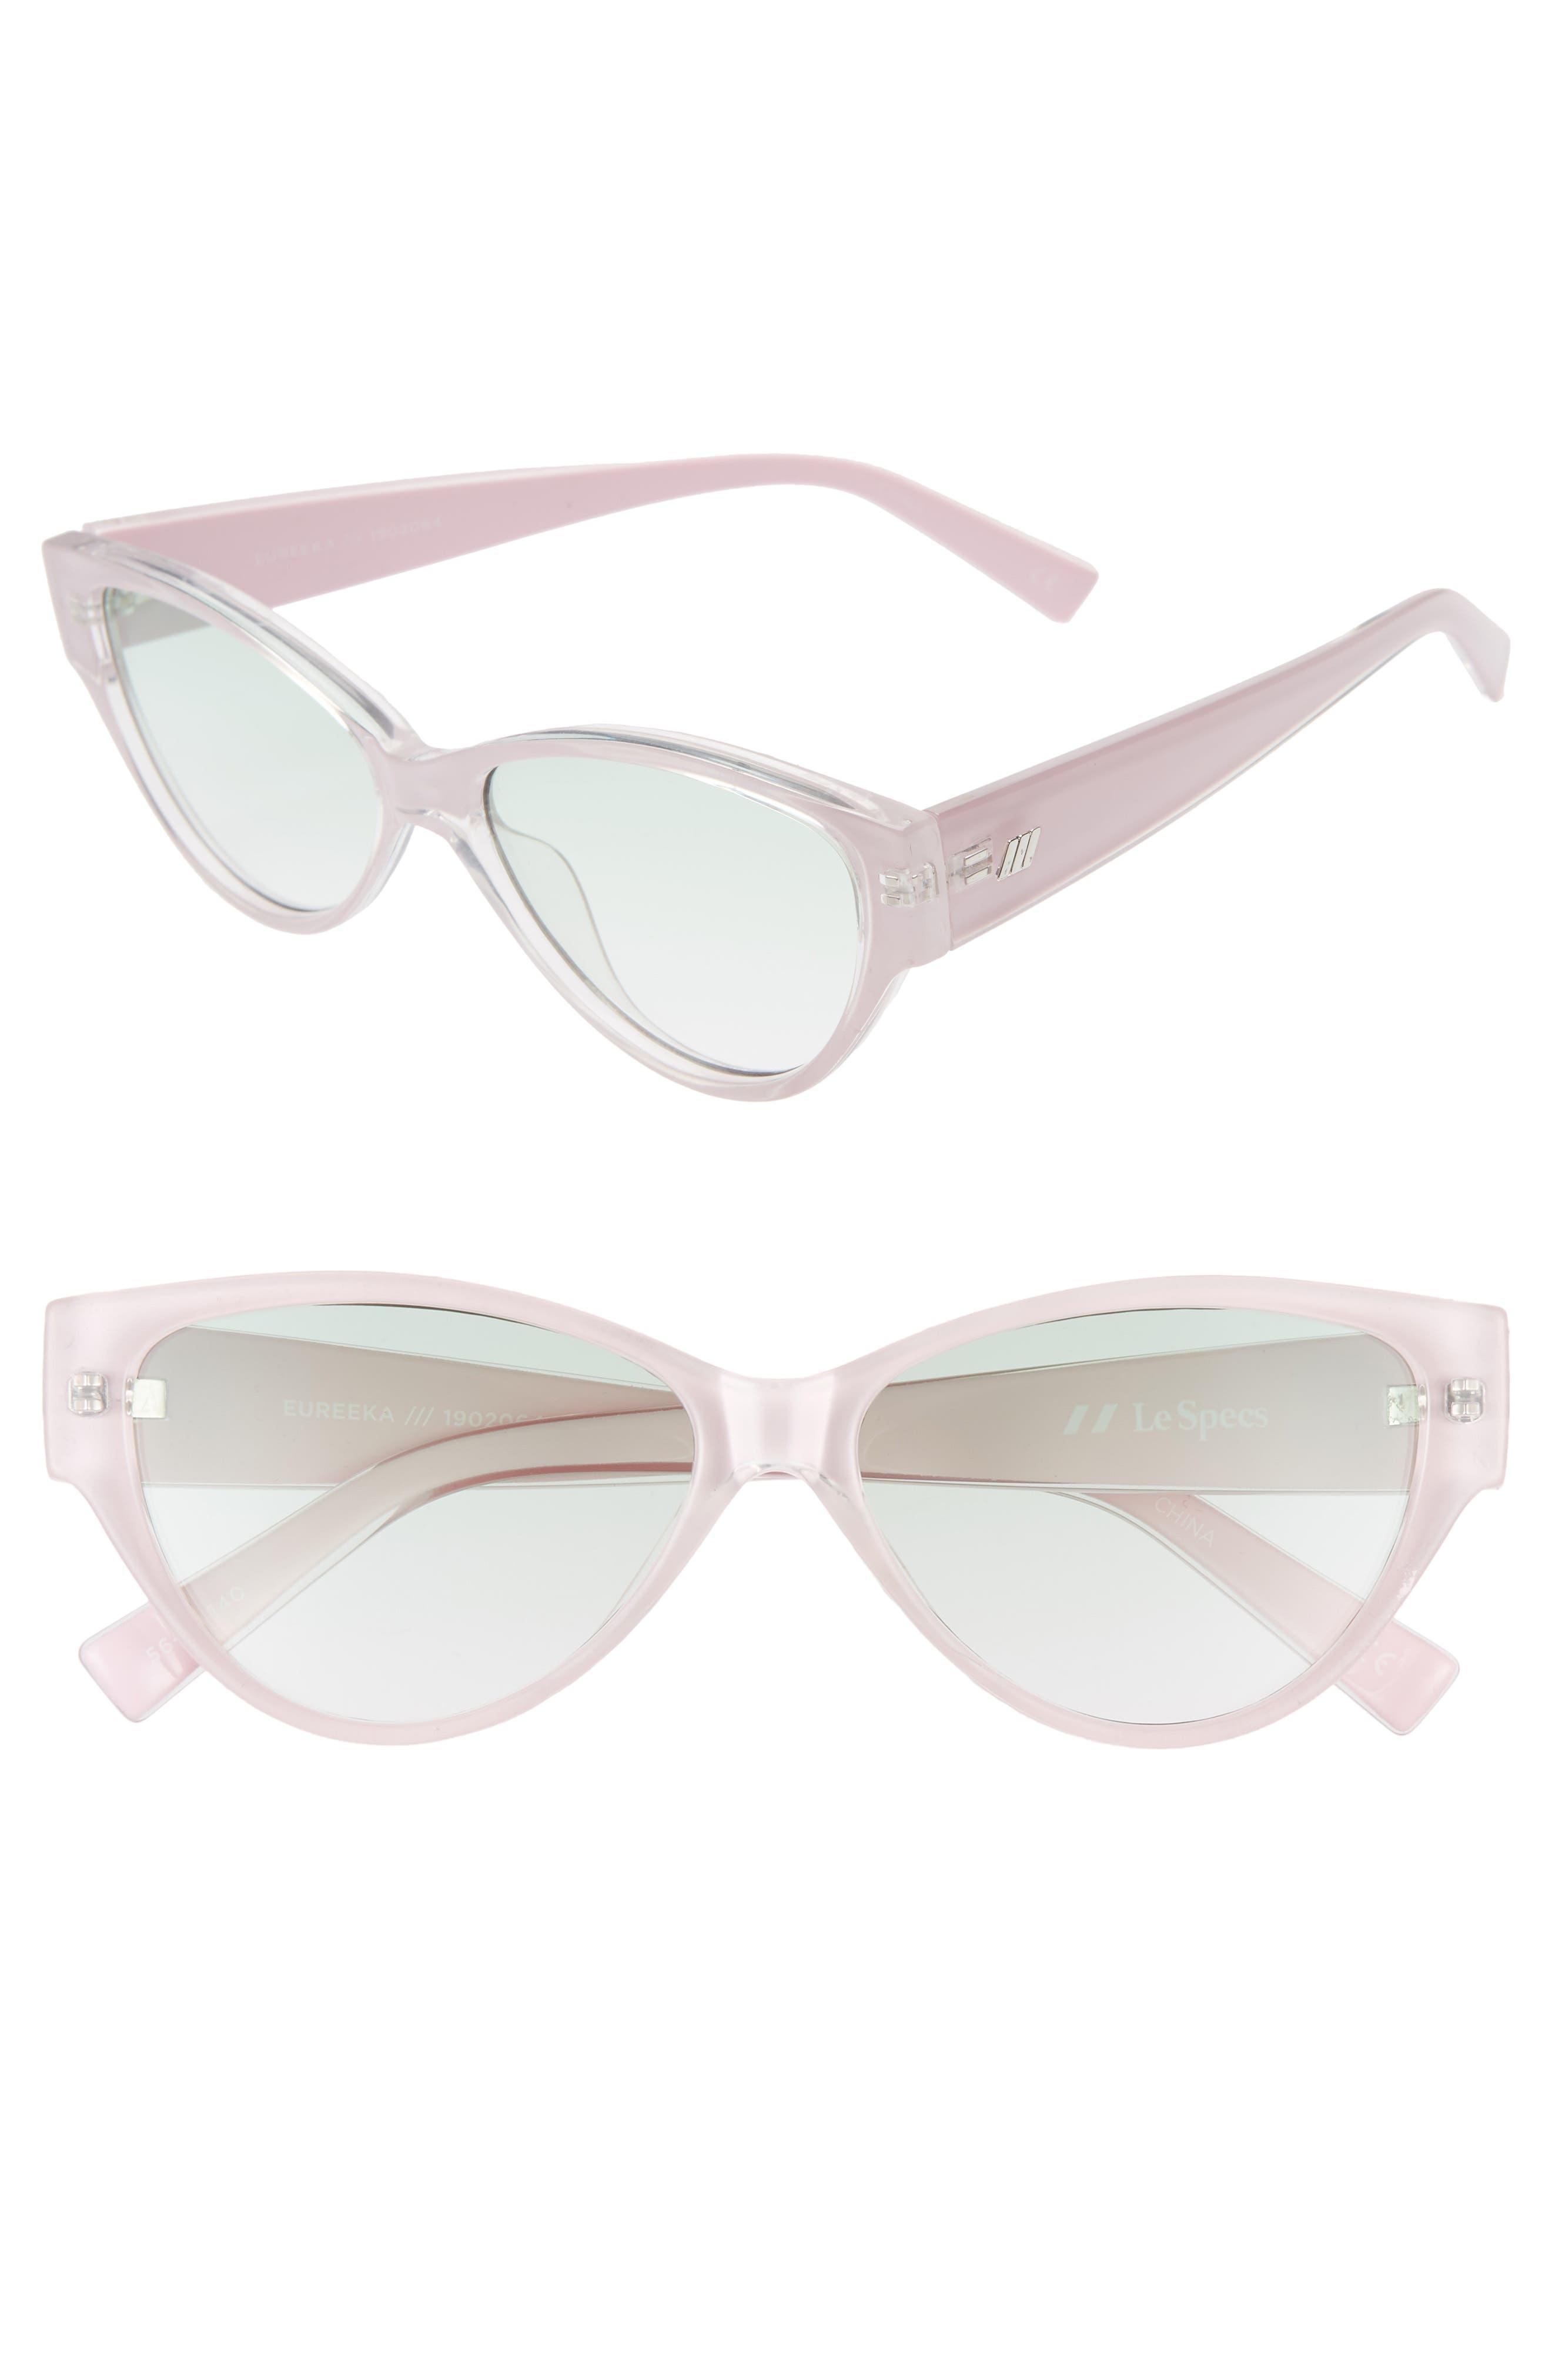 Le Specs Eureka 5m Cat Eye Sunglasses - Apple Blossom/ Jade Gradient